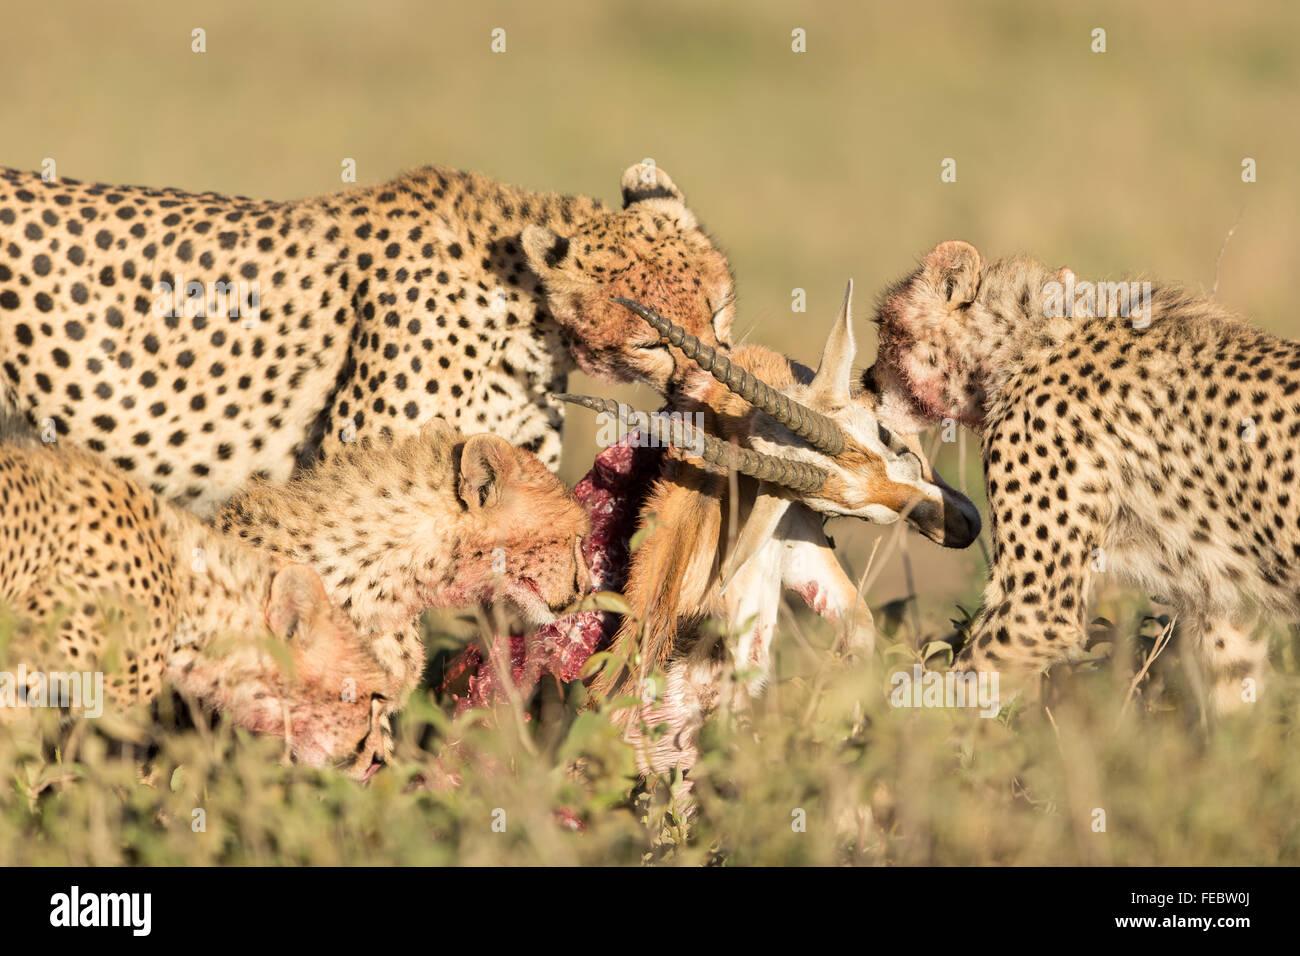 Four Sub Adult Cheetah feeding on gazelle in the Serengeti National Park Tanzania - Stock Image